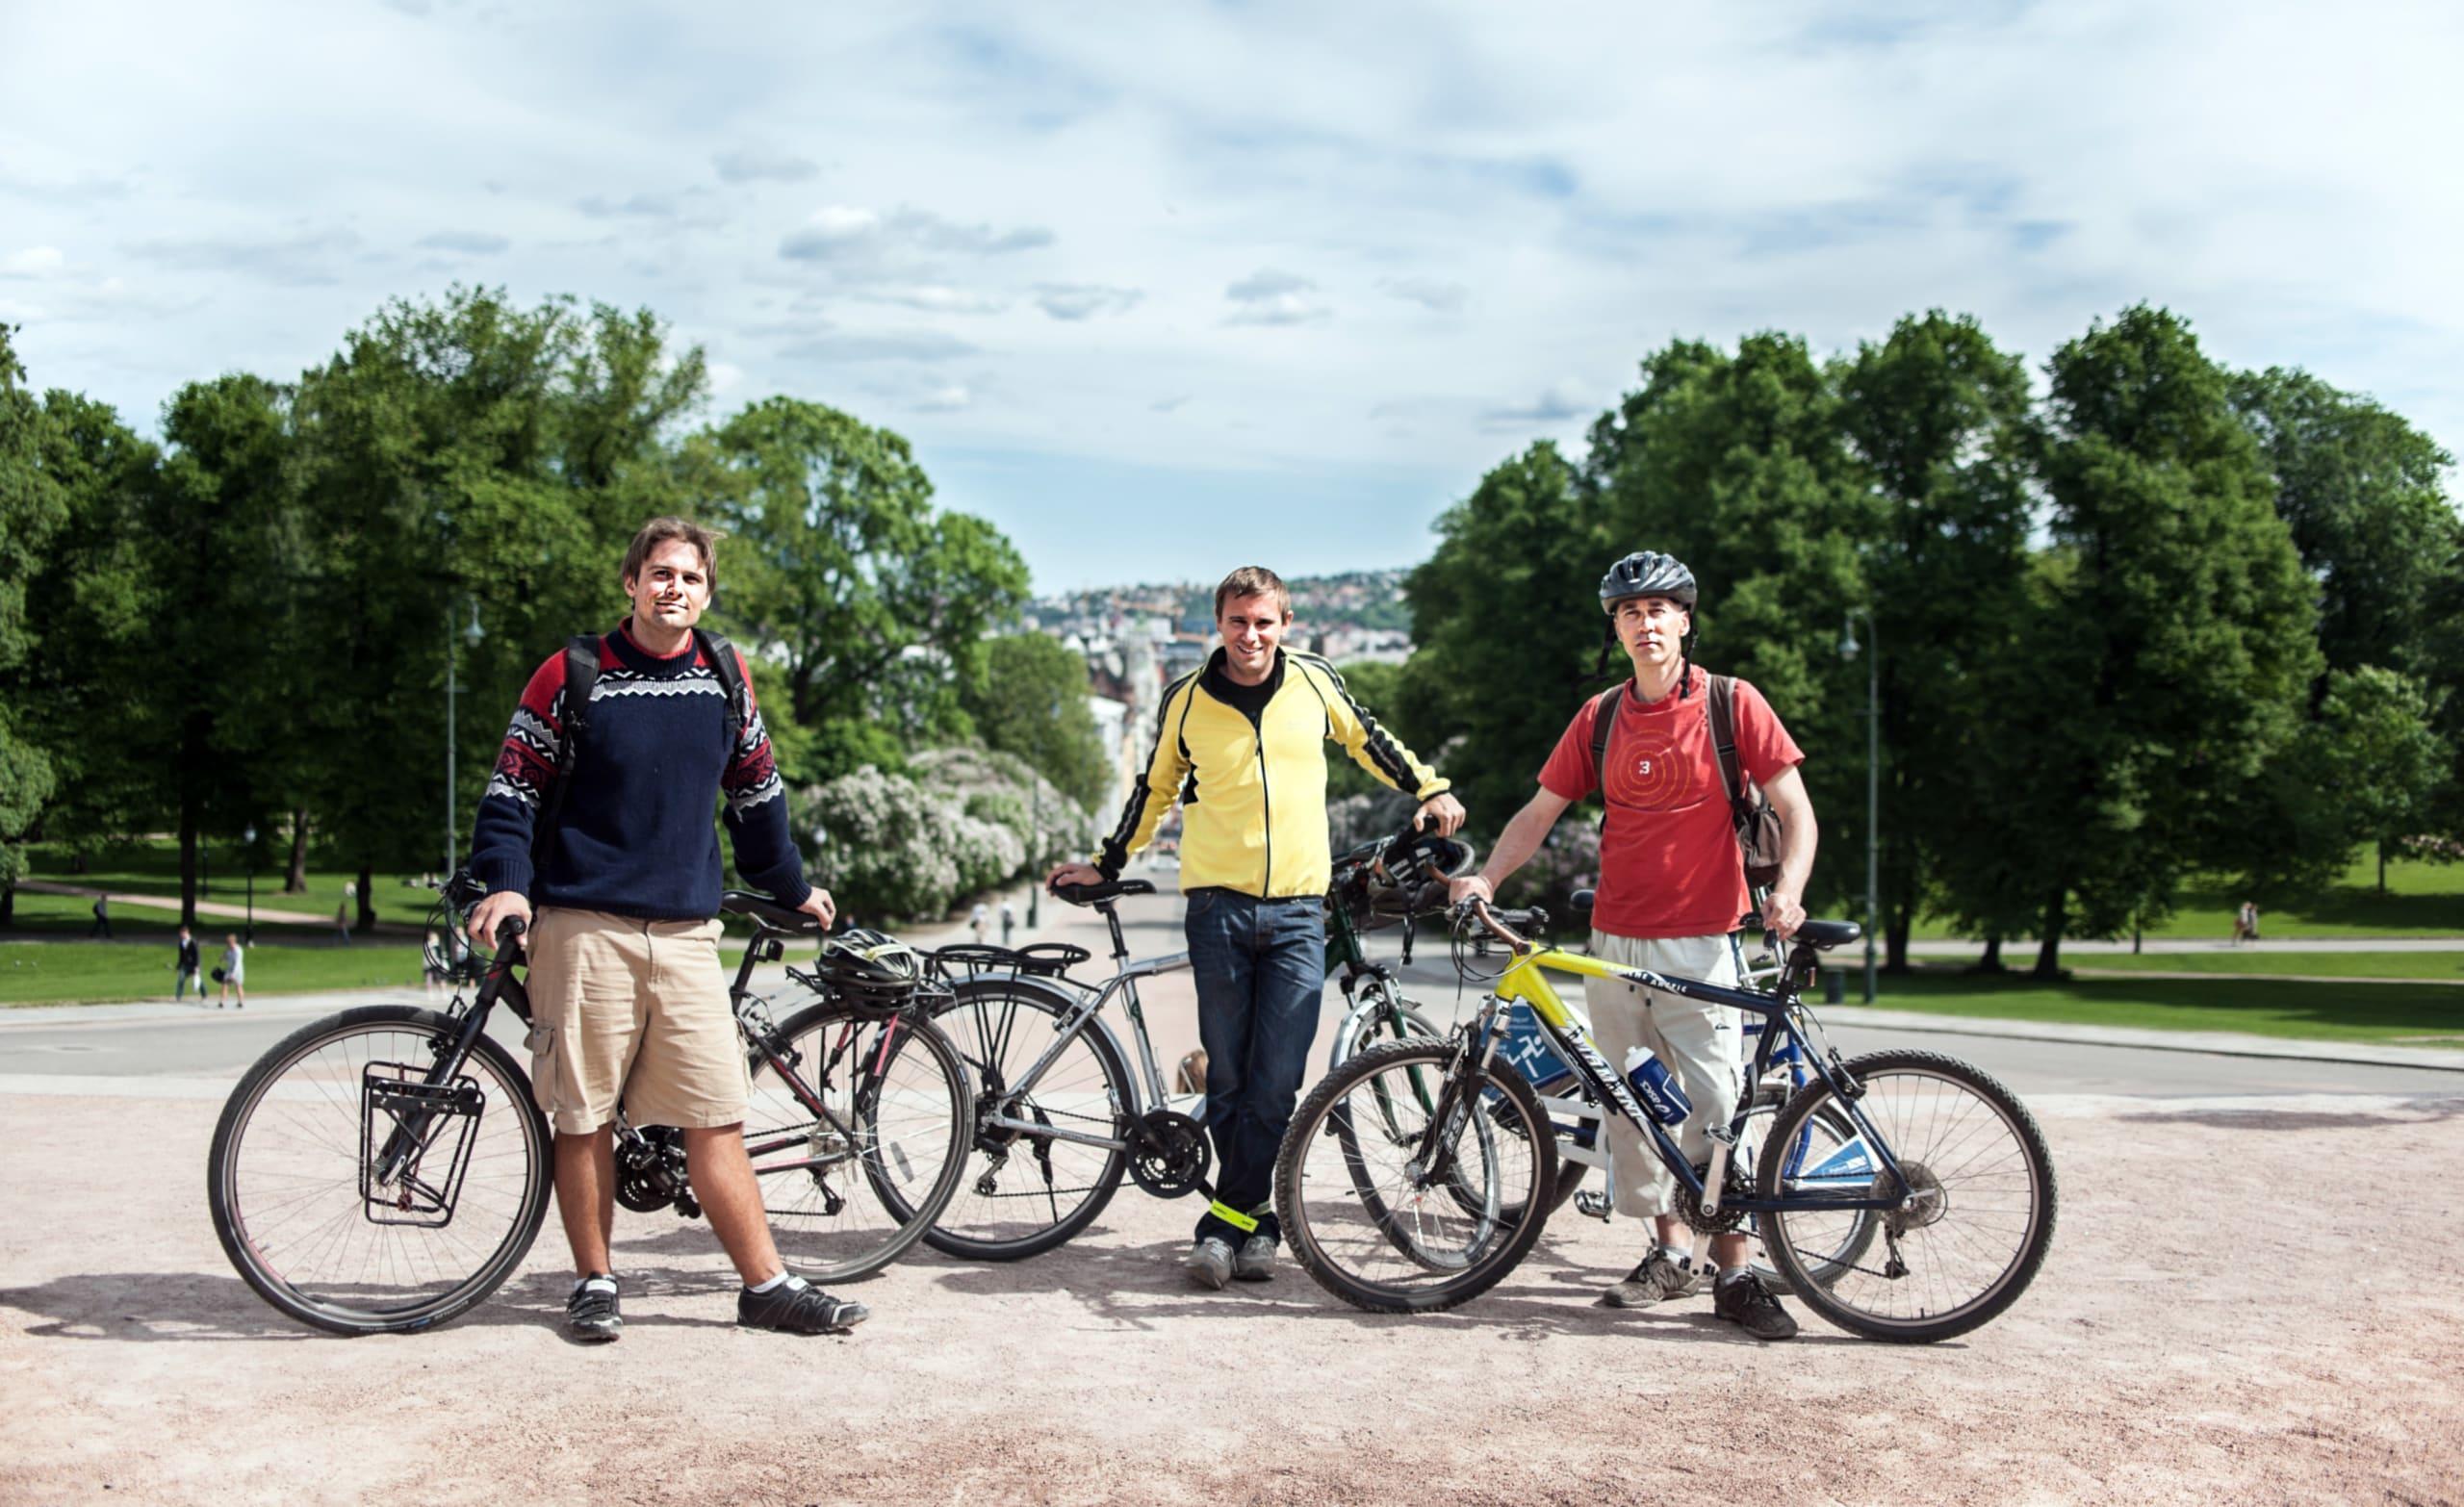 Three tourists exploring Oslo by bike.